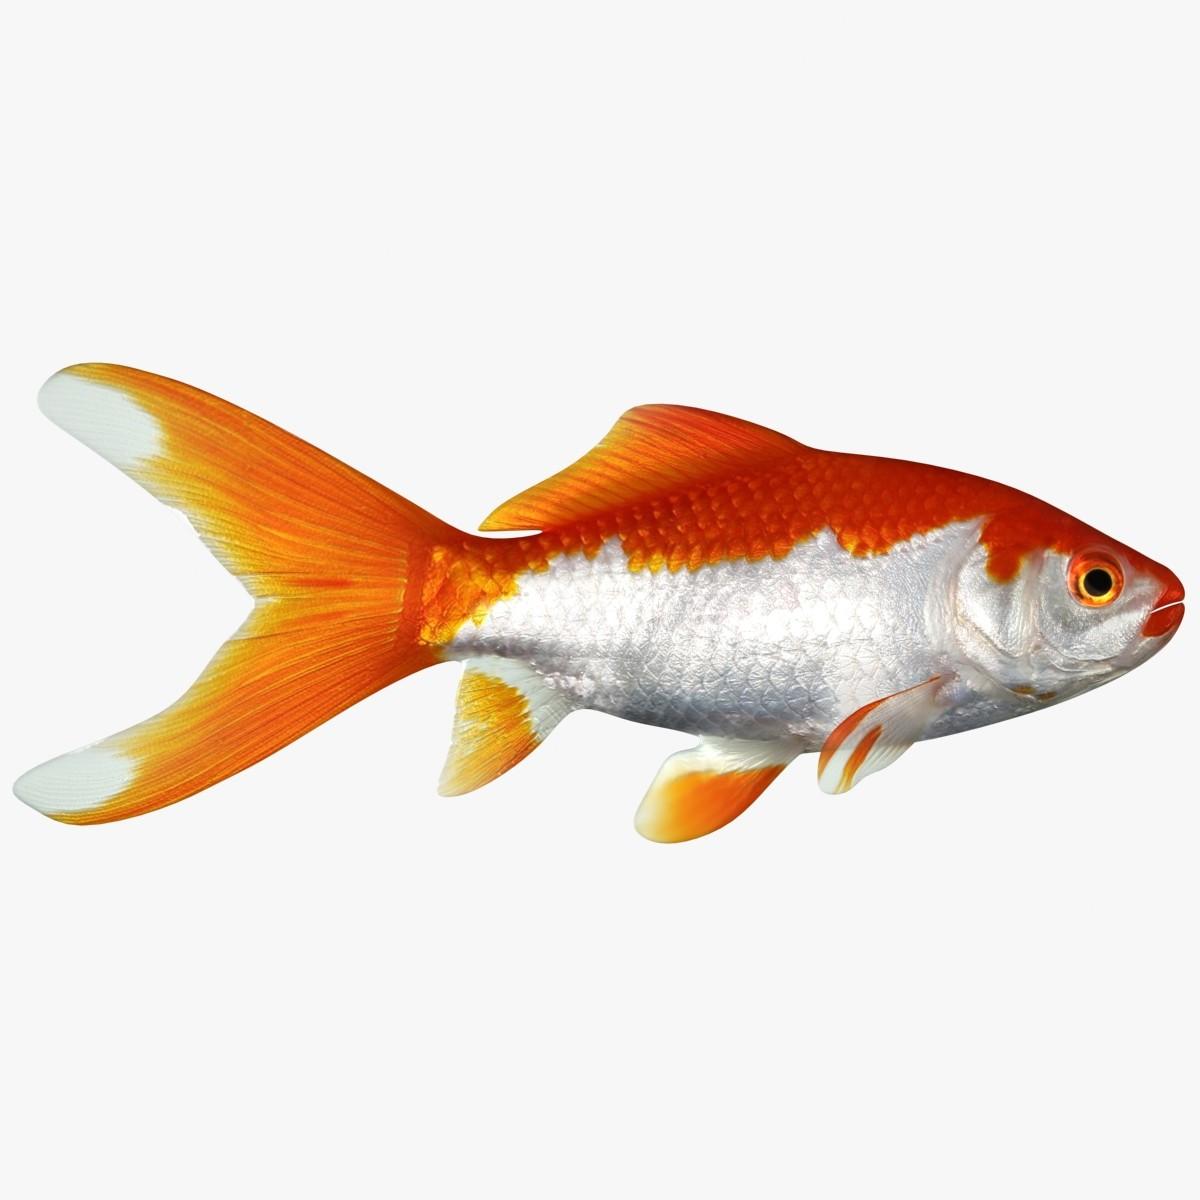 Goldfish_2_Rr-01.jpg